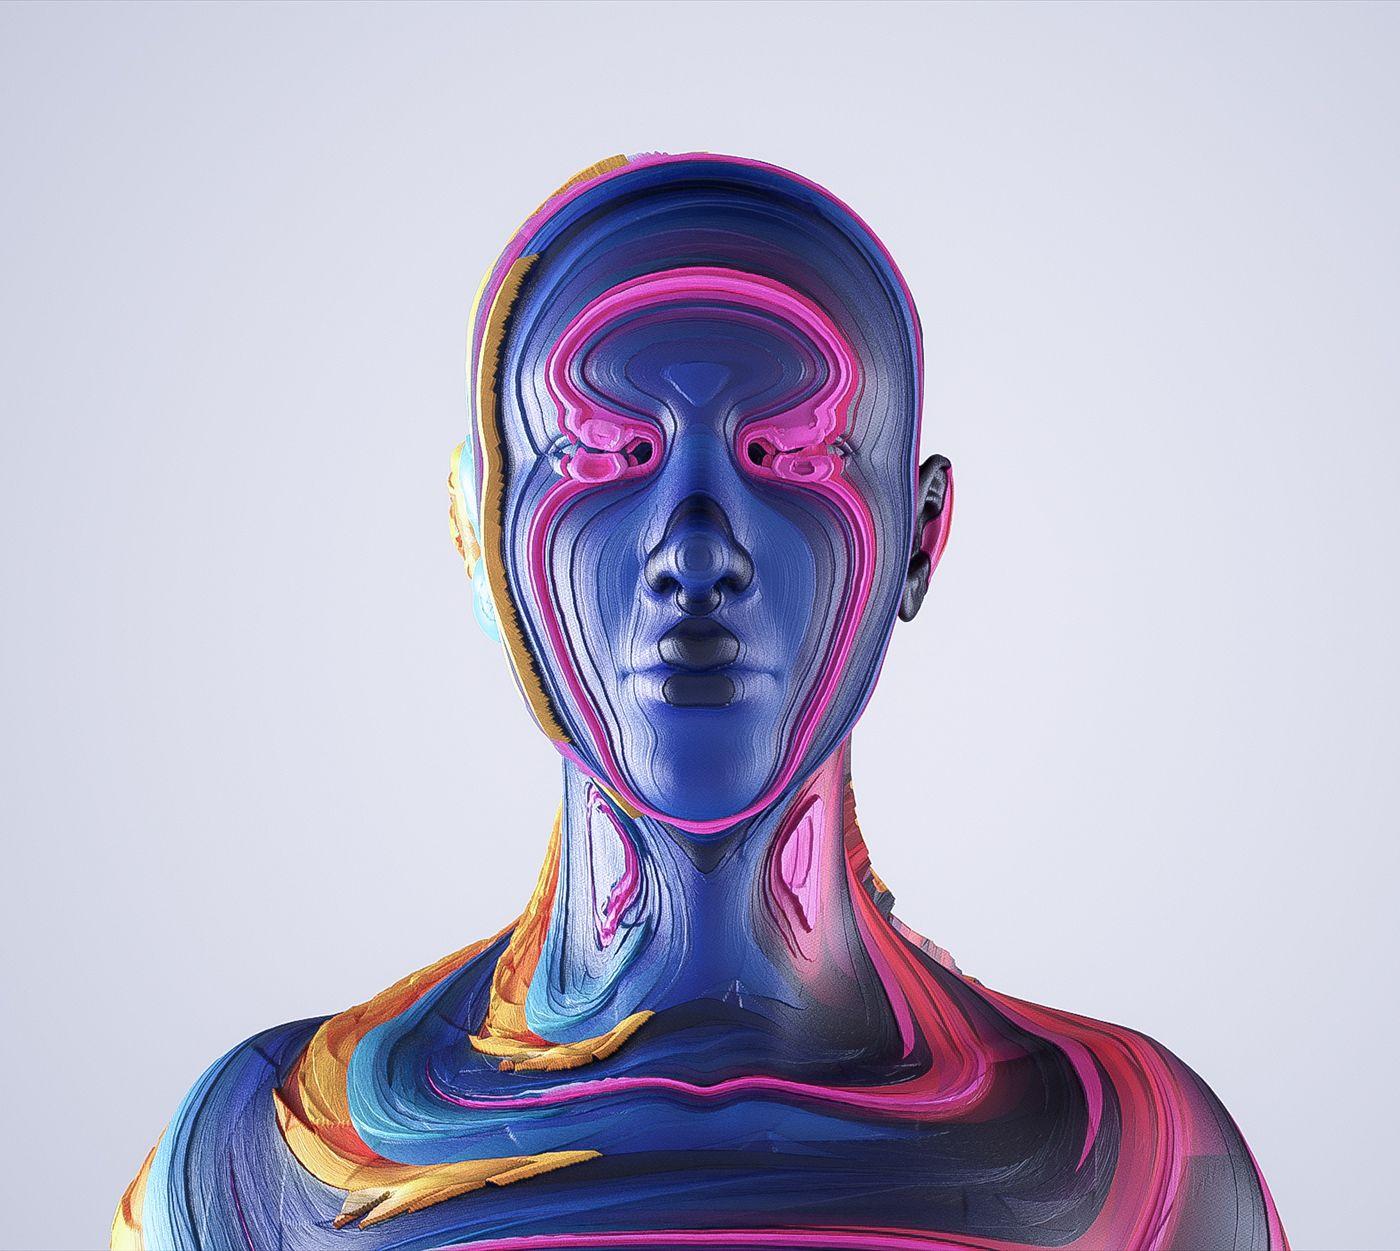 3D Visualization / Displacement